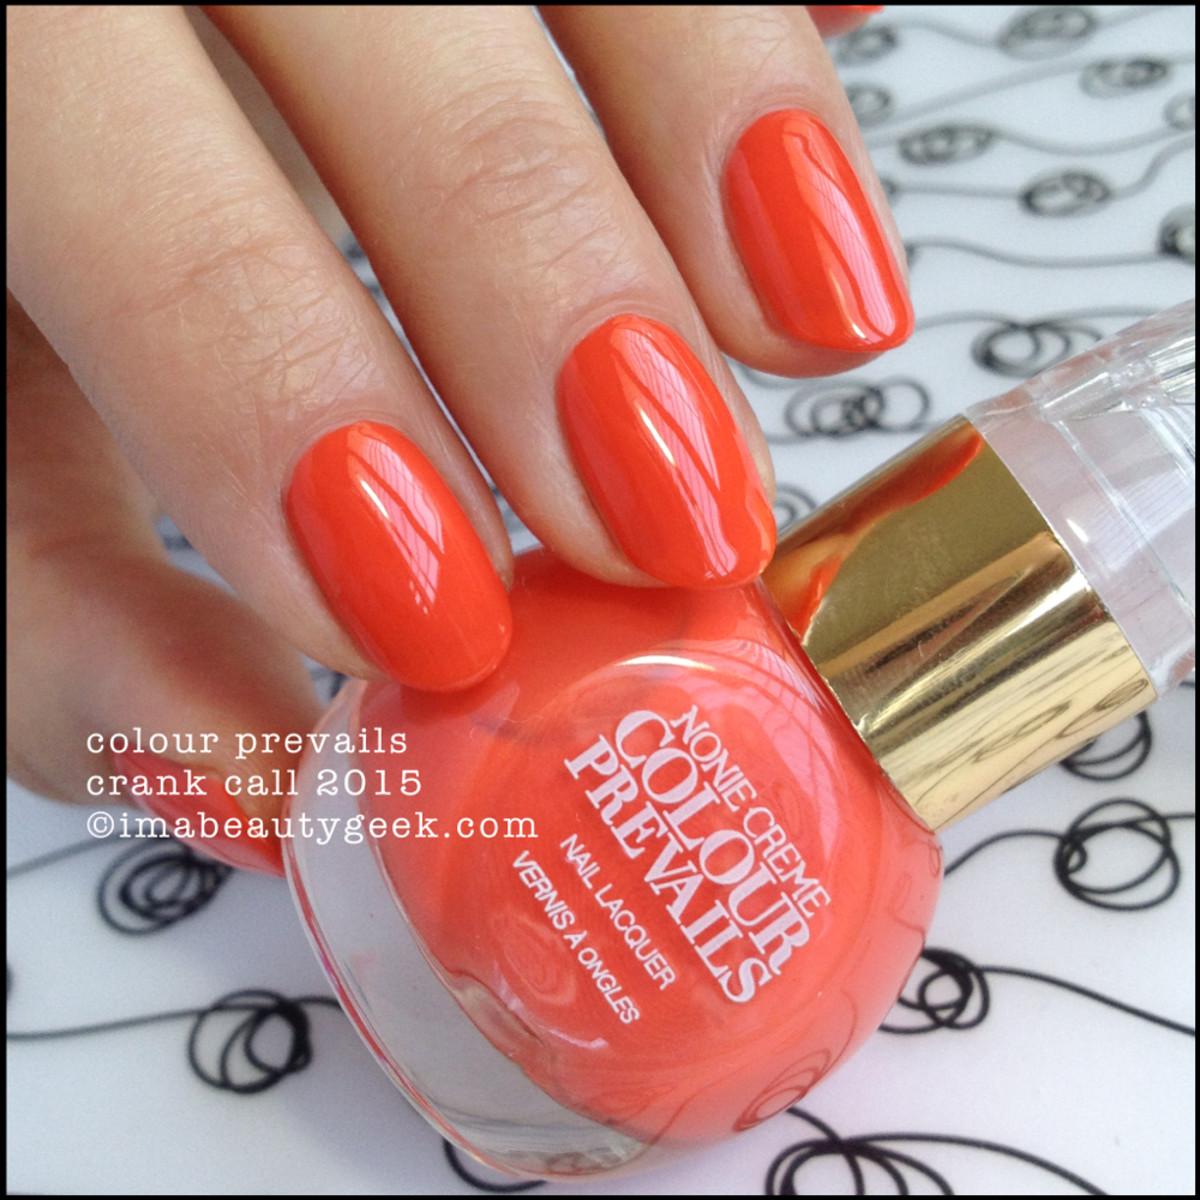 Colour Prevails Crank Call Nail Polish by Nonie Creme